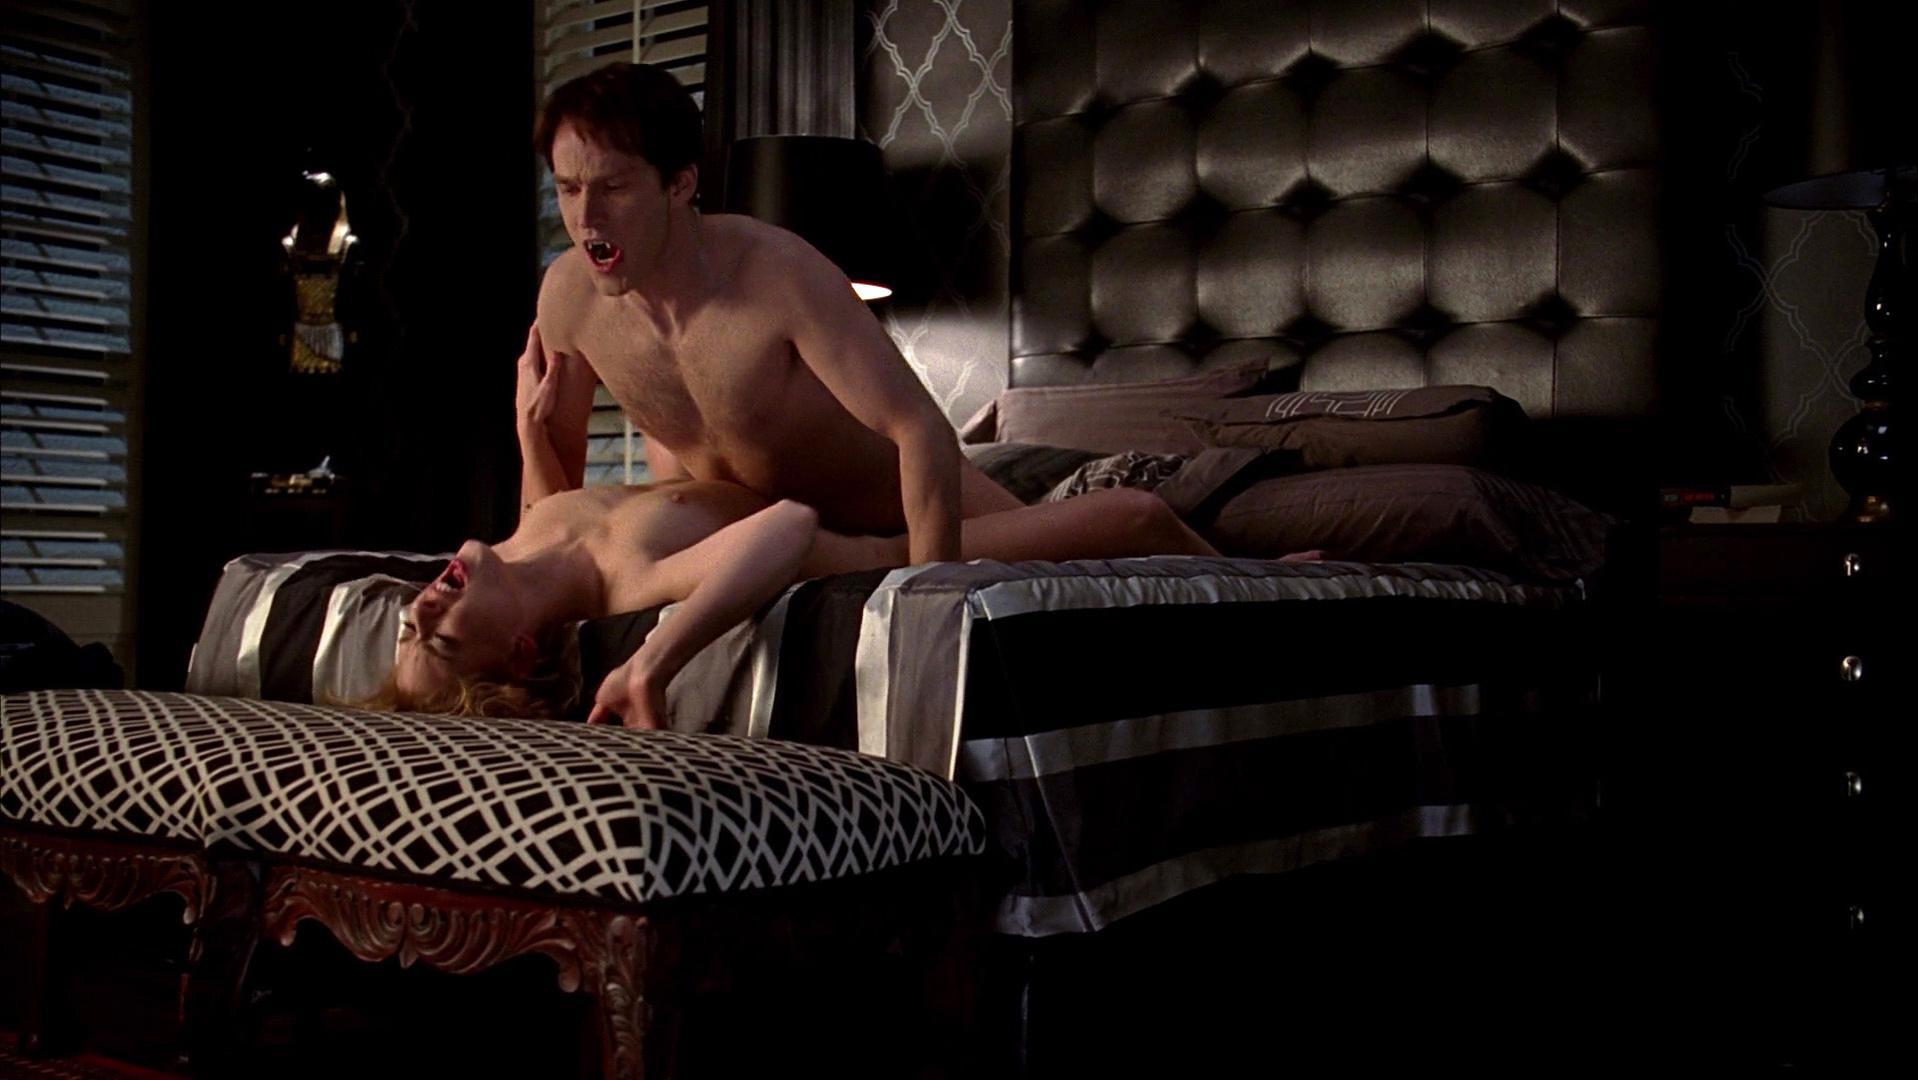 nude video celebs alexandra breckenridge nude janina